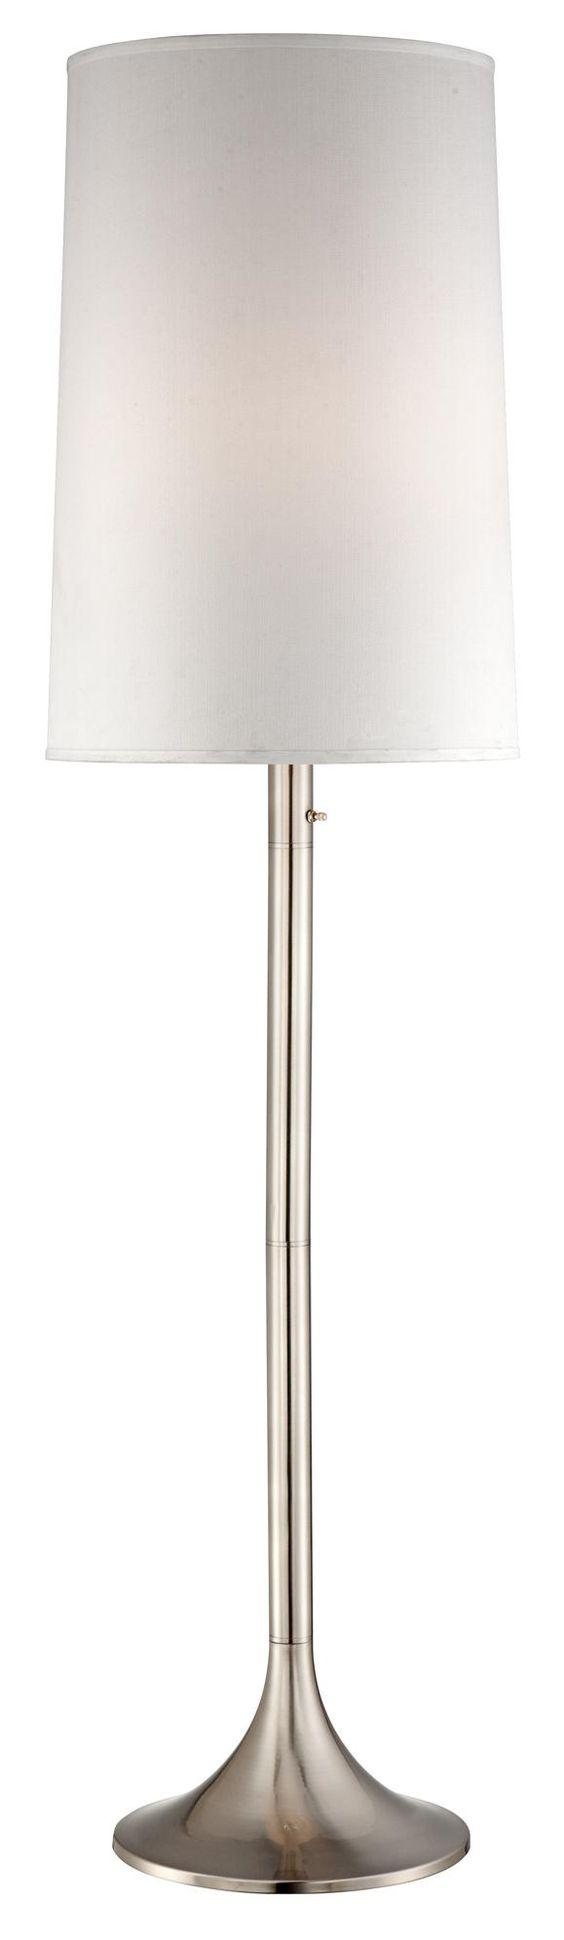 possini euro design light blaster trumpet floor lamp. Black Bedroom Furniture Sets. Home Design Ideas